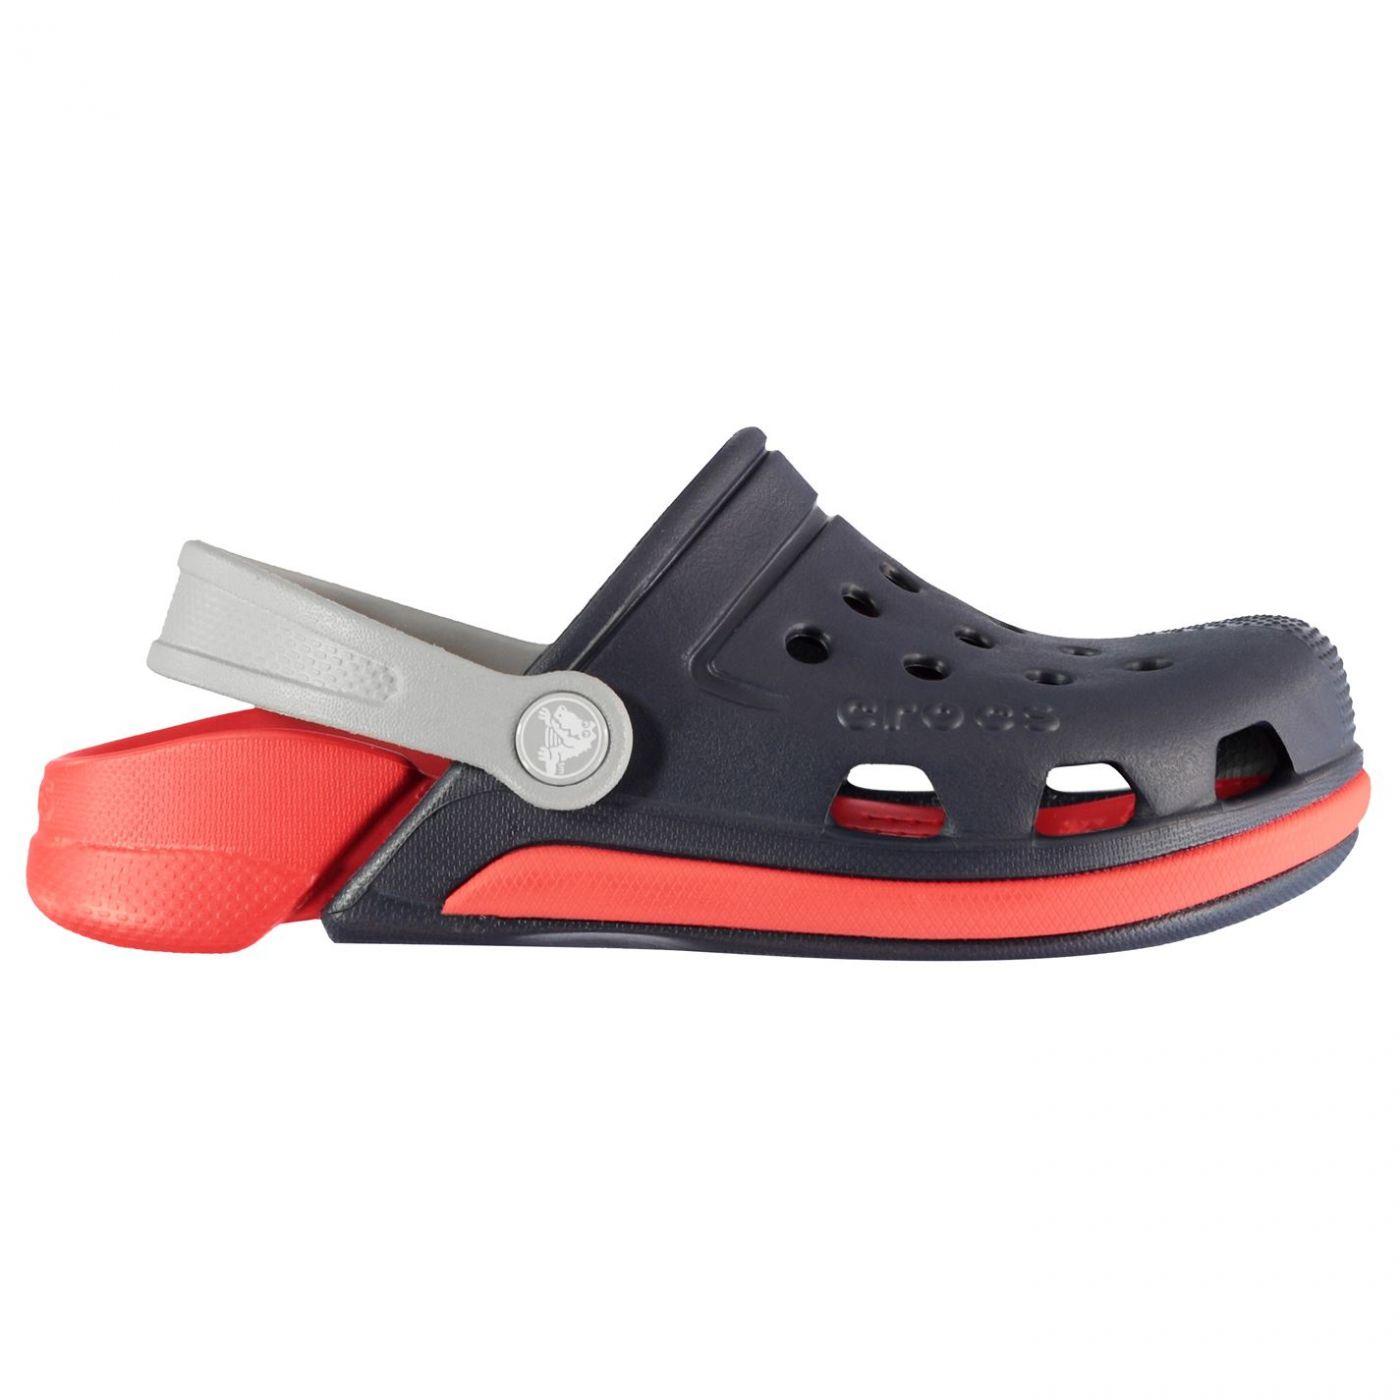 Crocs Electro 3 Cloggs Childrens